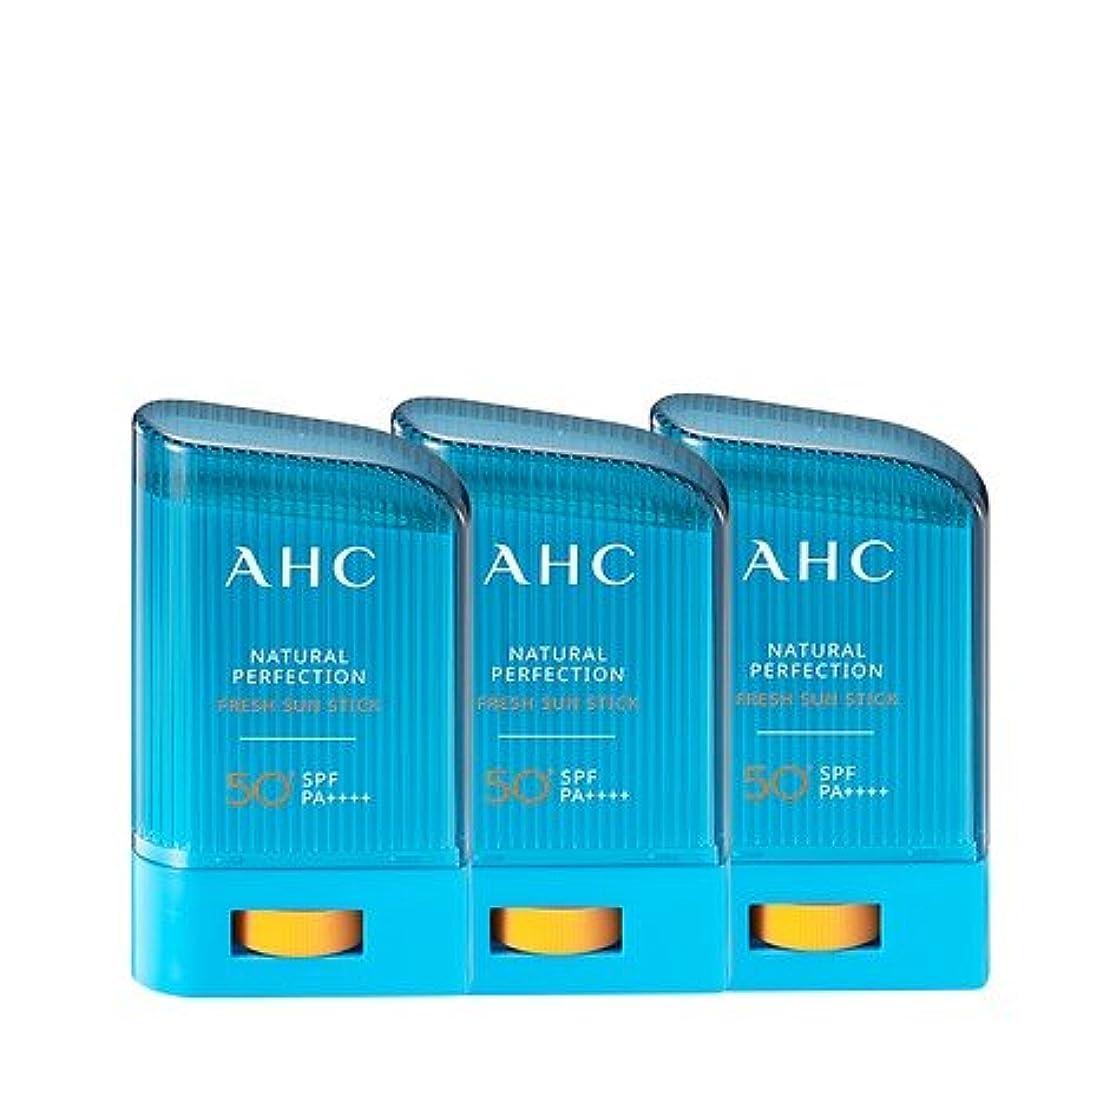 AHC Natural perfection fresh sun stick 14g× 3個 ナチュラルパーフェクション フレッシュサンスティック [並行輸入品]